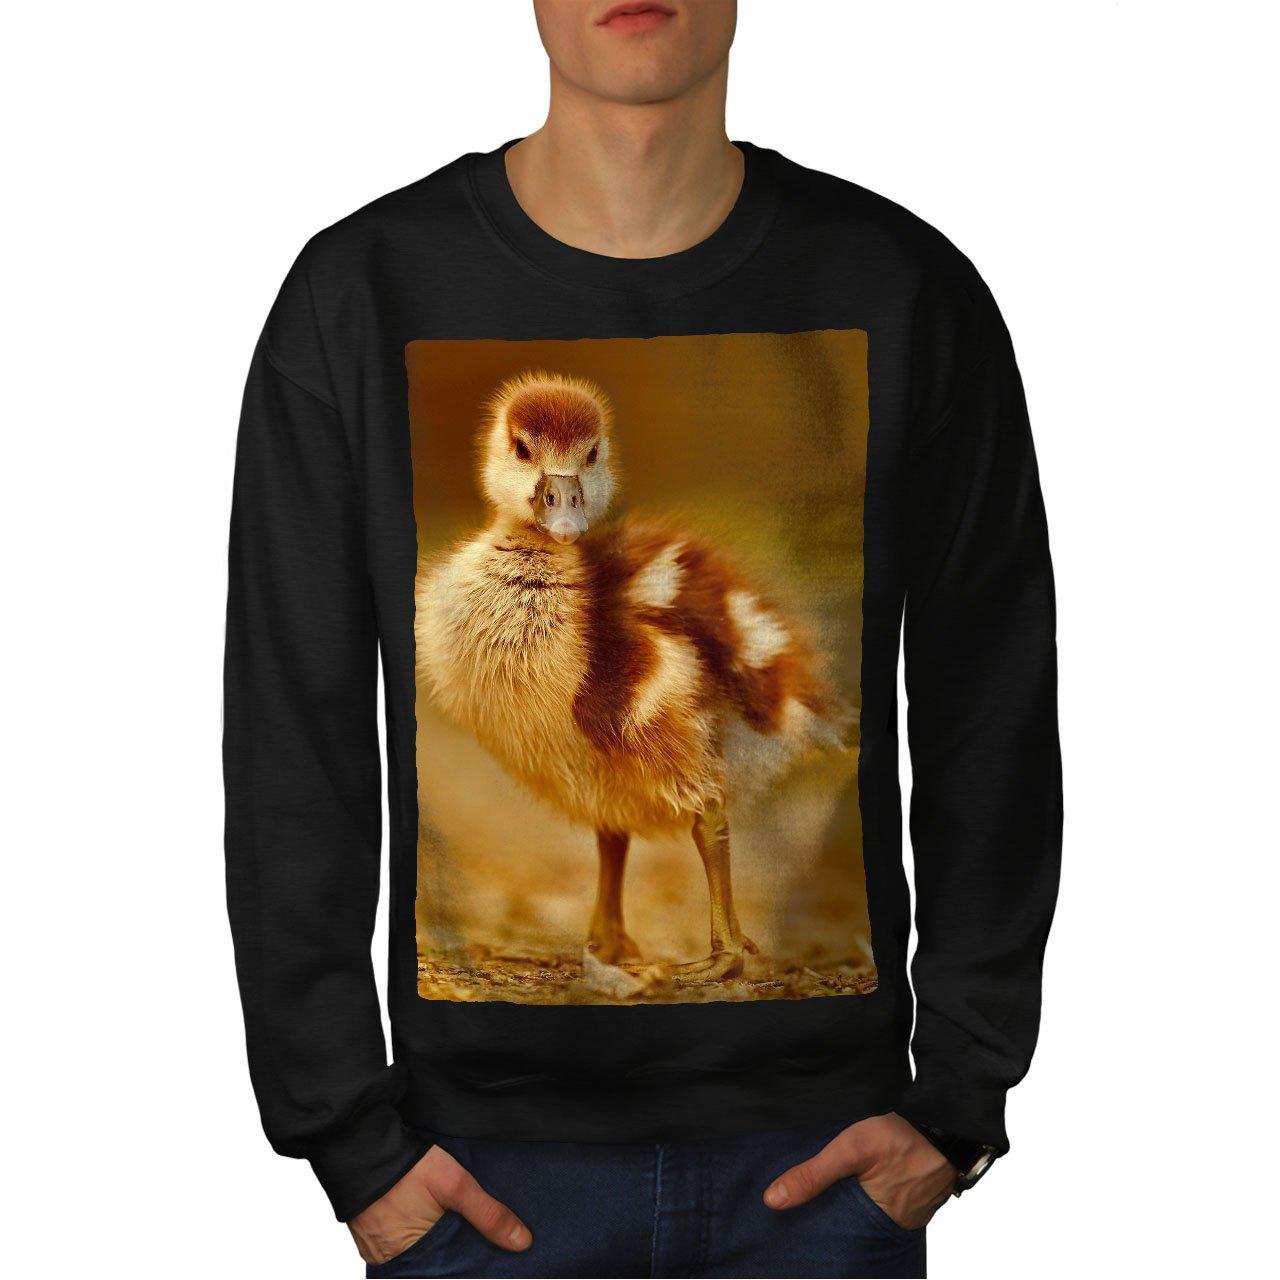 Farm Casual Jumper wellcoda Duck Cute Photo Animal Mens Sweatshirt